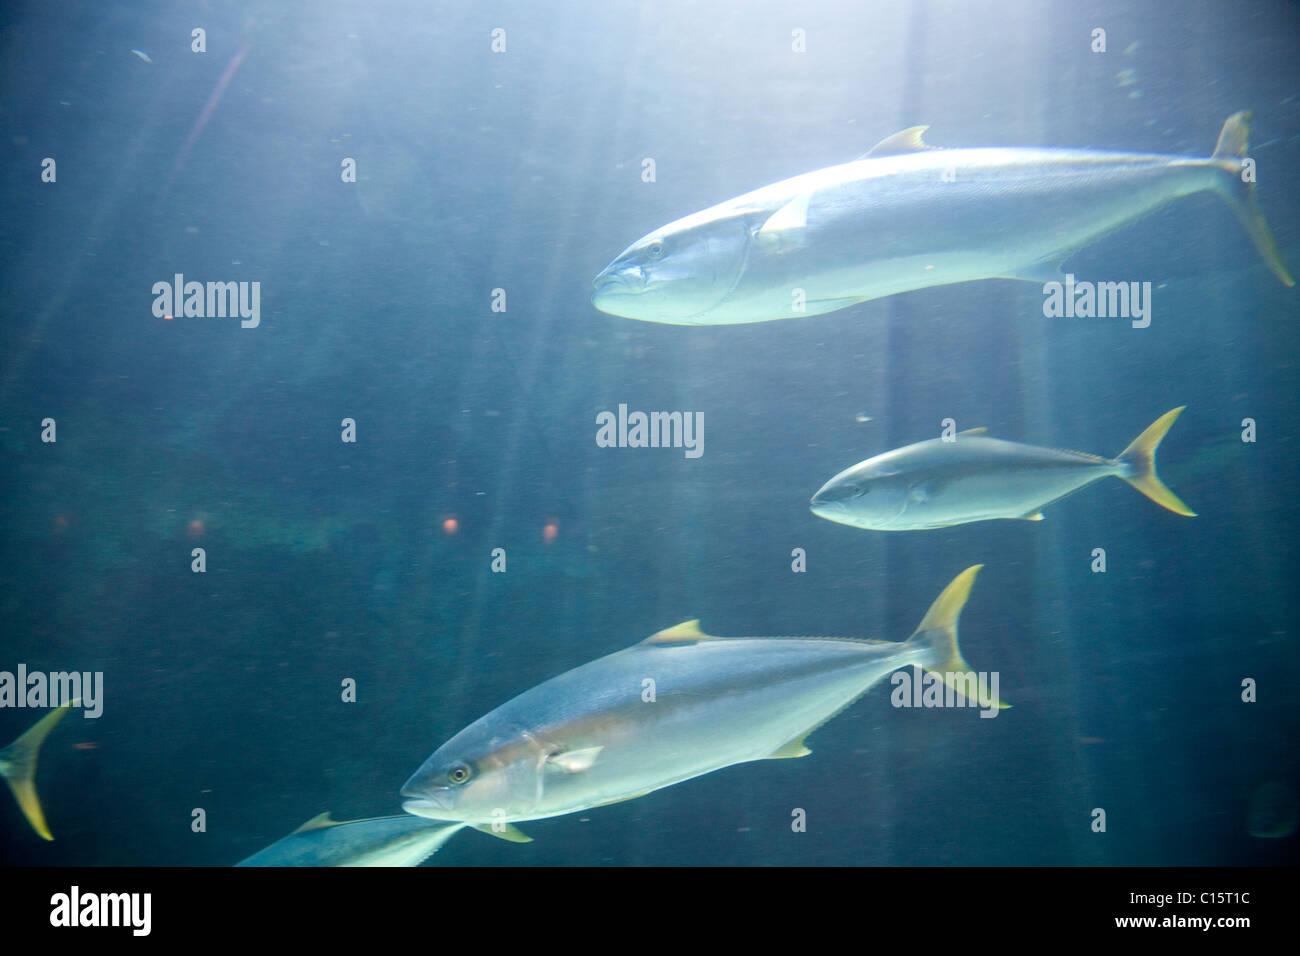 Two Oceans Aquarium - Cape Yellowtail - Stock Image